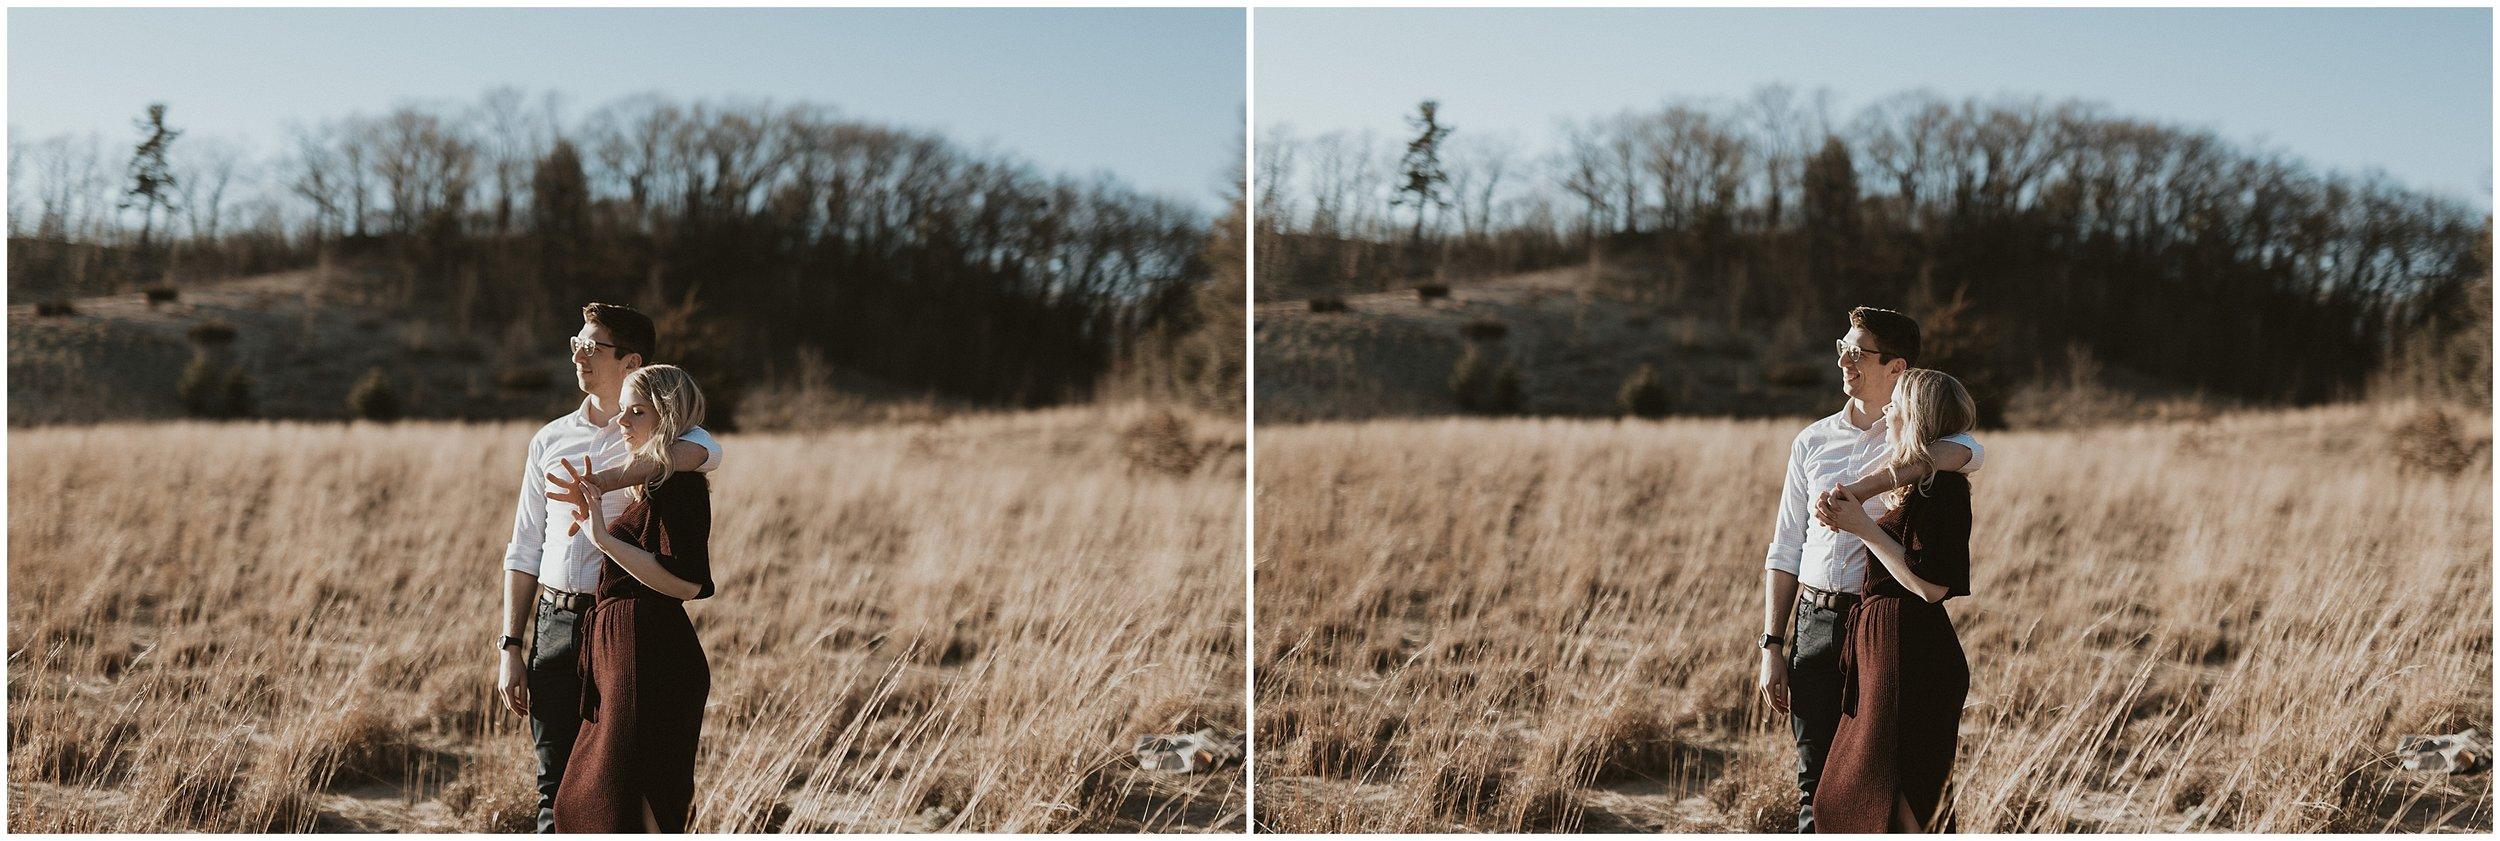 JAELYNNROSEPHOTOGRAPHY-8271.jpg